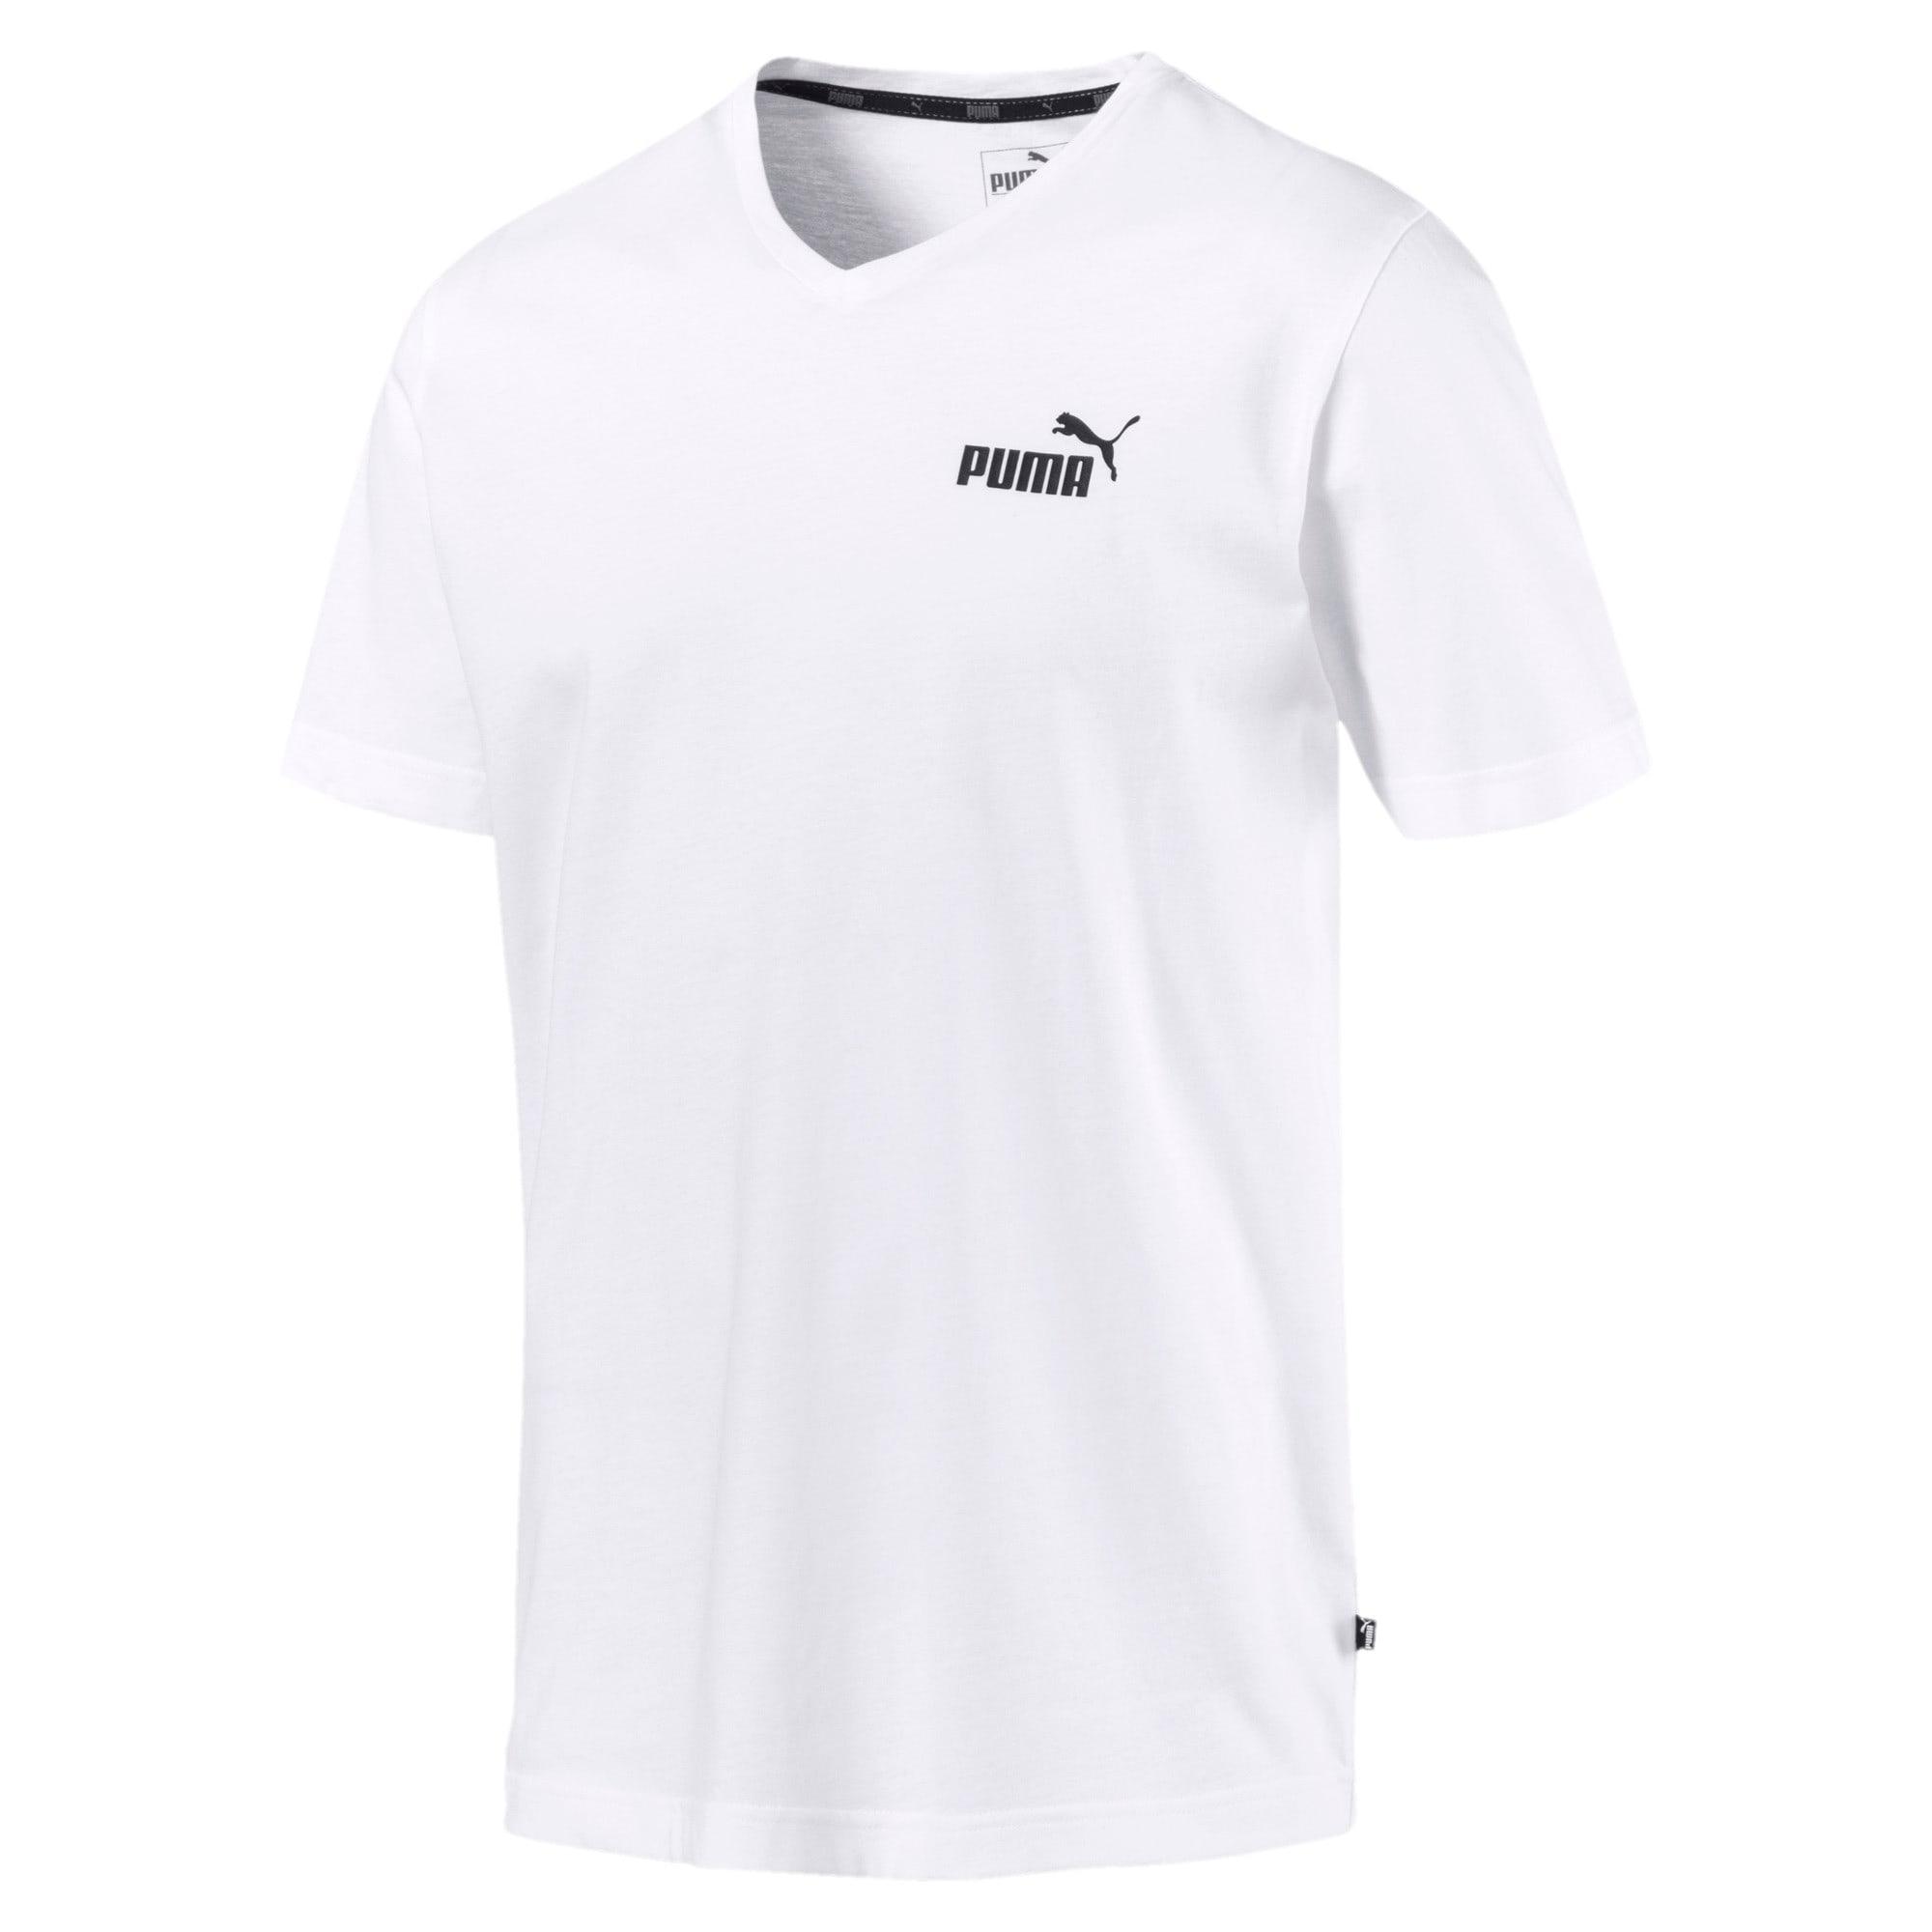 Thumbnail 4 of T-shirt con scollo a V Essentials uomo, Puma White, medium